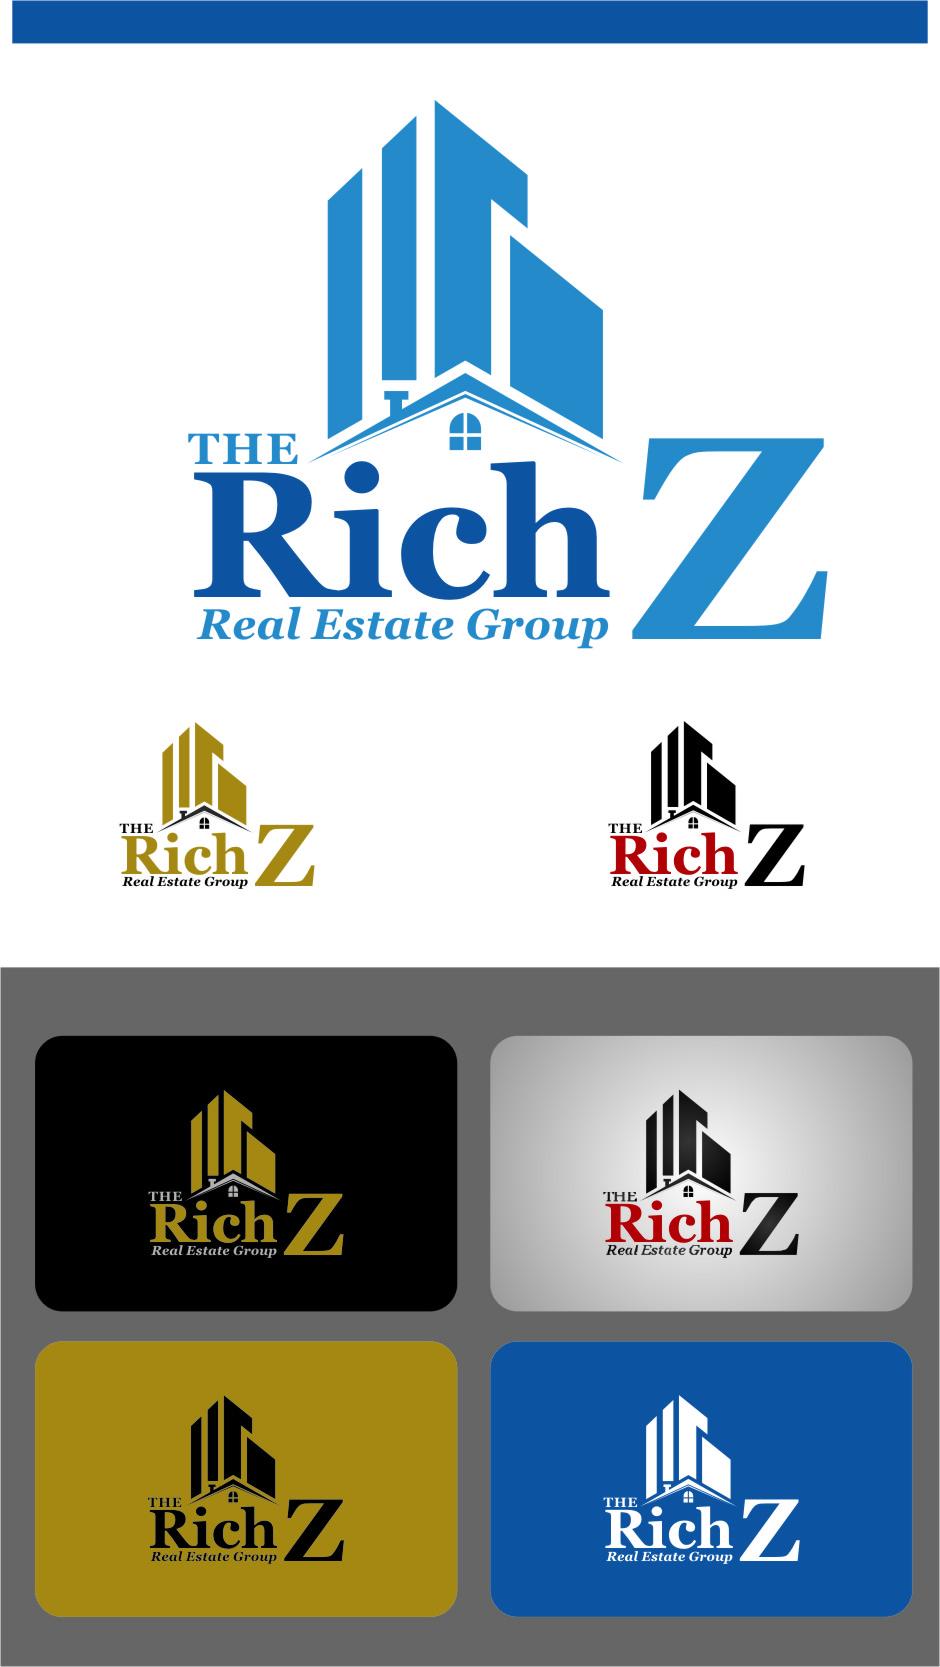 Logo Design by Ngepet_art - Entry No. 162 in the Logo Design Contest The Rich Z. Real Estate Group Logo Design.